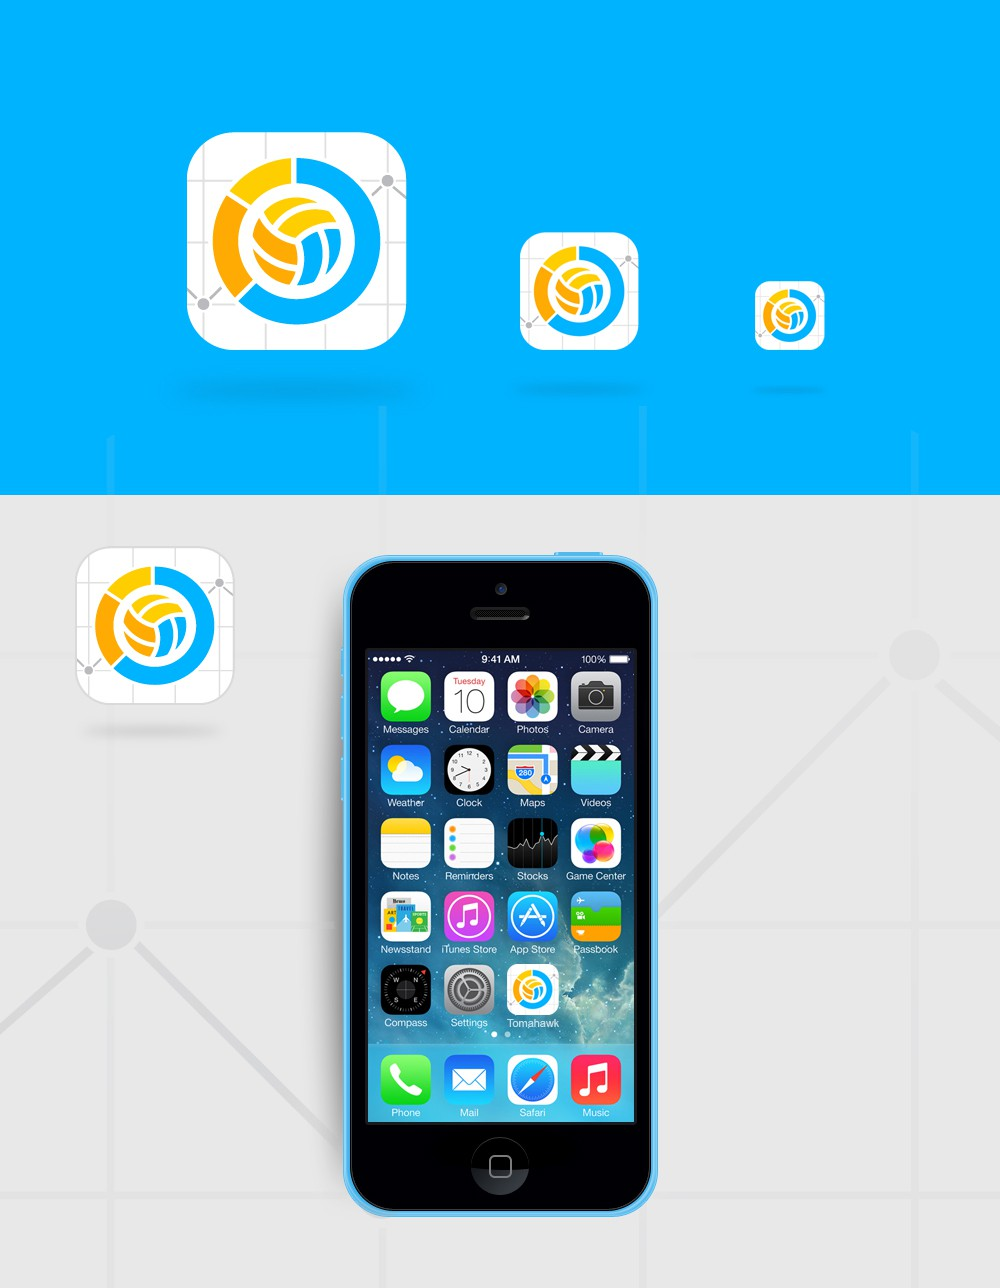 Create an app icon for beach volleyball analytics app